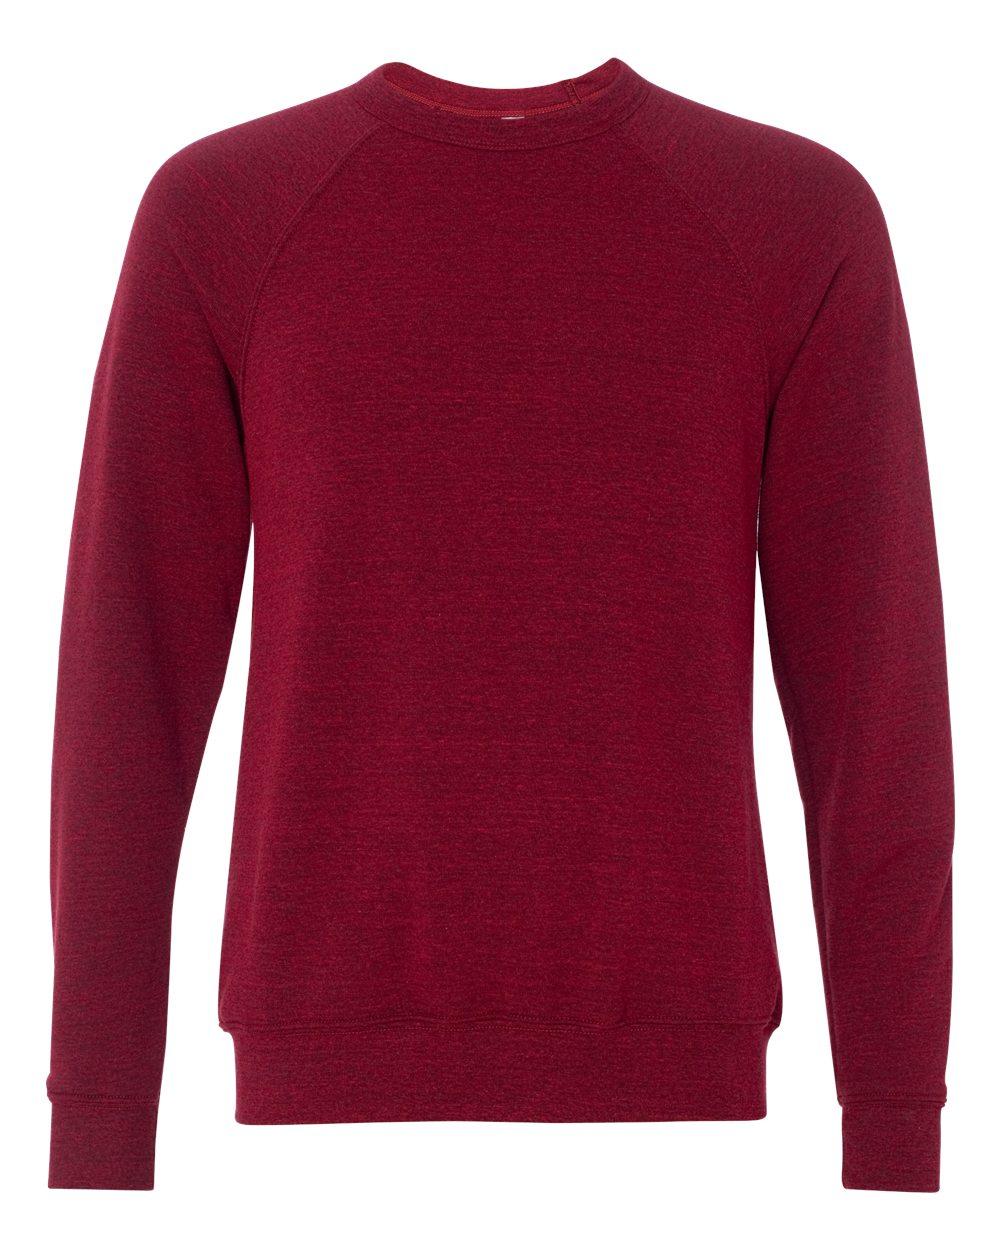 Bella-Canvas-Unisex-Sponge-Fleece-Crewneck-Sweatshirt-Top-Blank-3901-up-to-2XL thumbnail 18